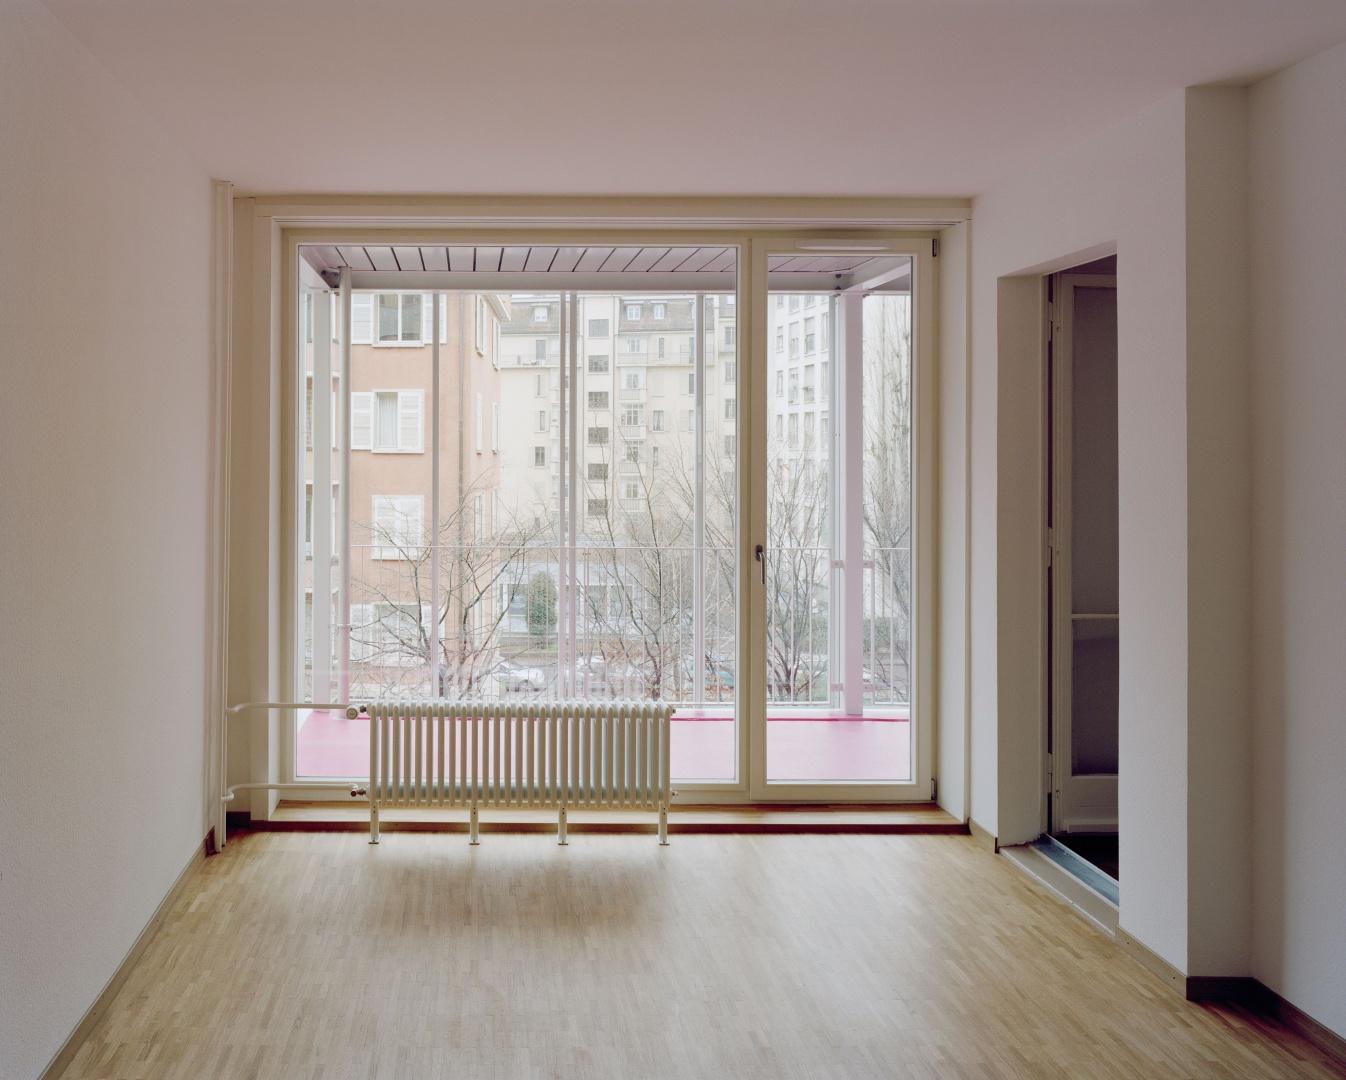 Salle de séjour rénovée avec véranda © Joël Tettamanti